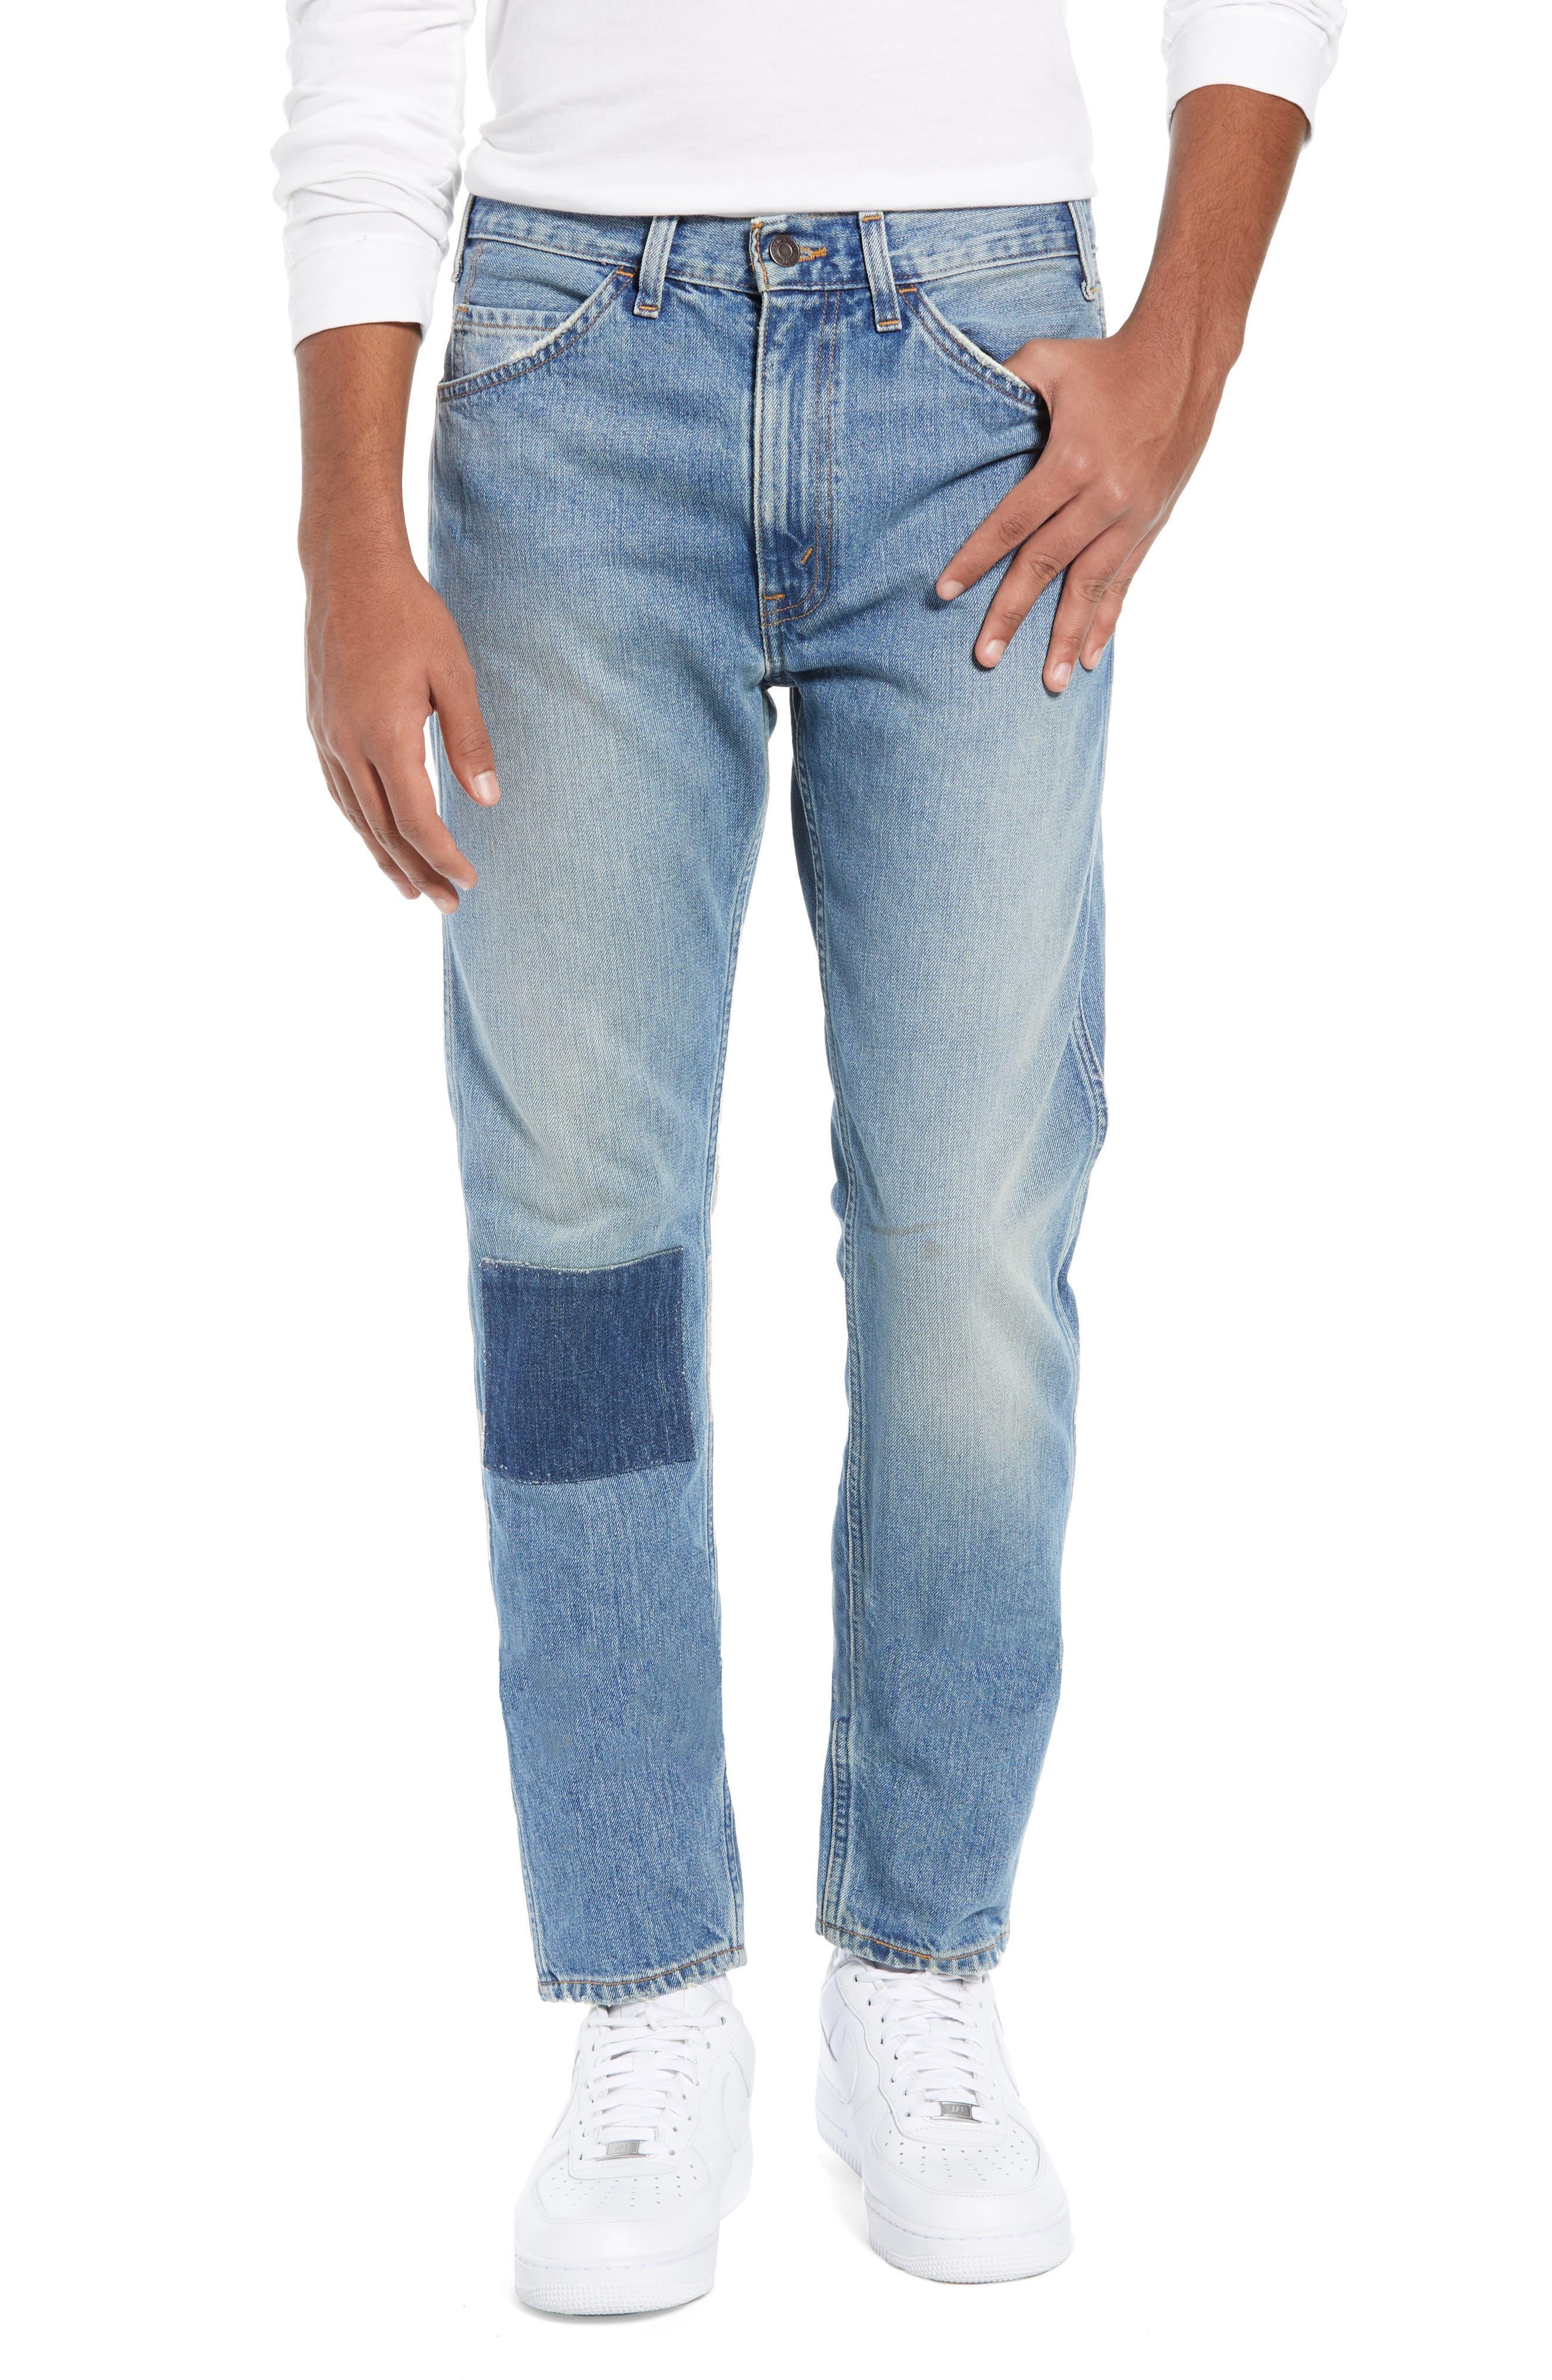 LEVI'S<SUP>®</SUP> VINTAGE CLOTHING 1969 606<sup>™</sup> Slim Fit Jeans, Main, color, 423